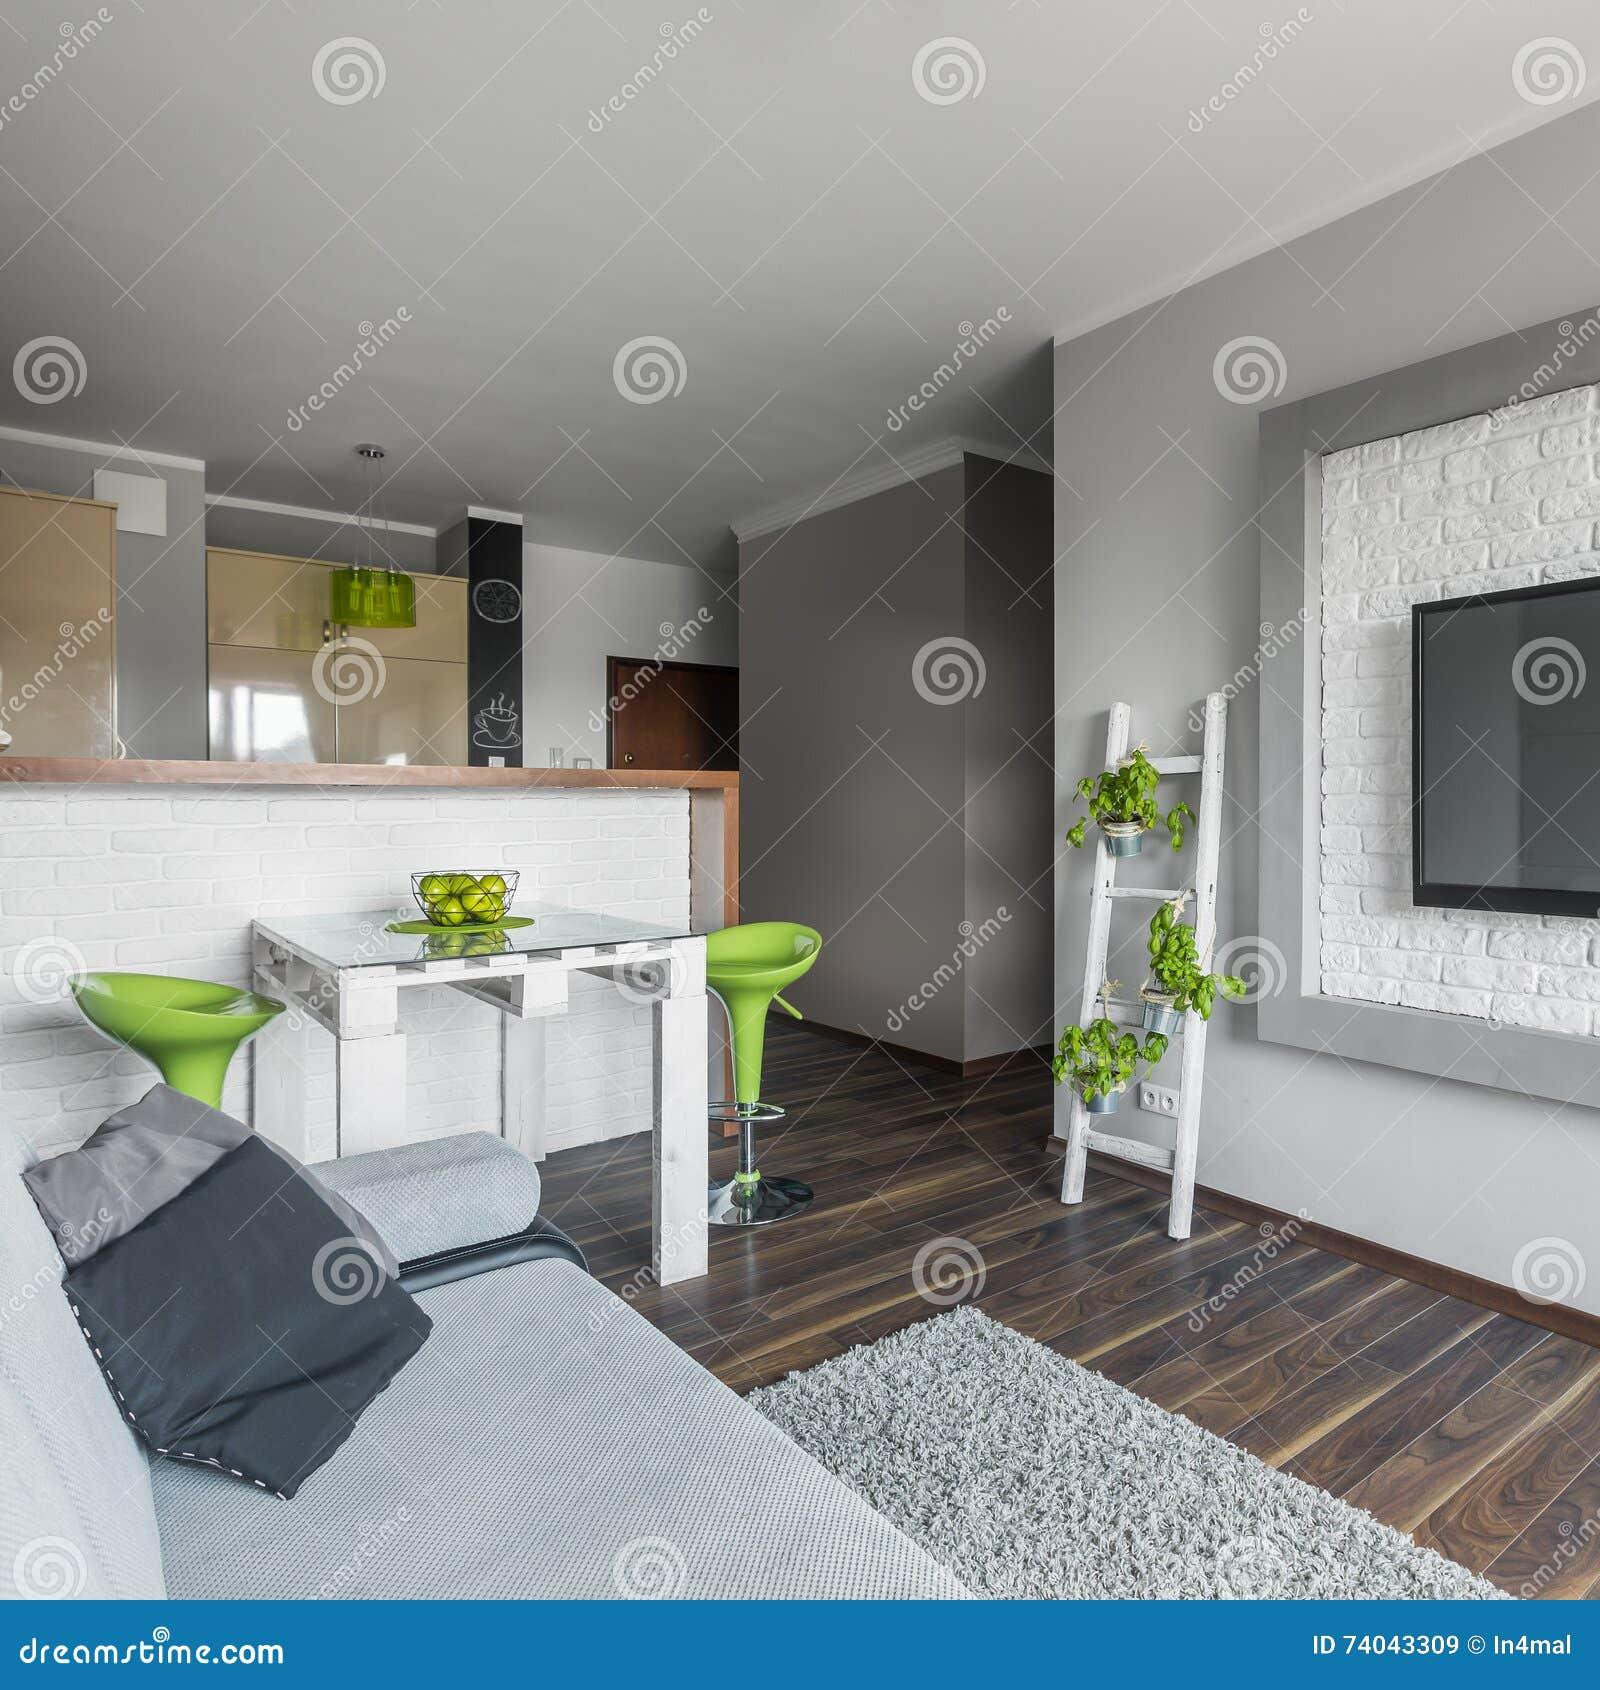 Apartamento Pequeno: Apartamento Moderno Pequeño Pero Funcional Foto De Archivo